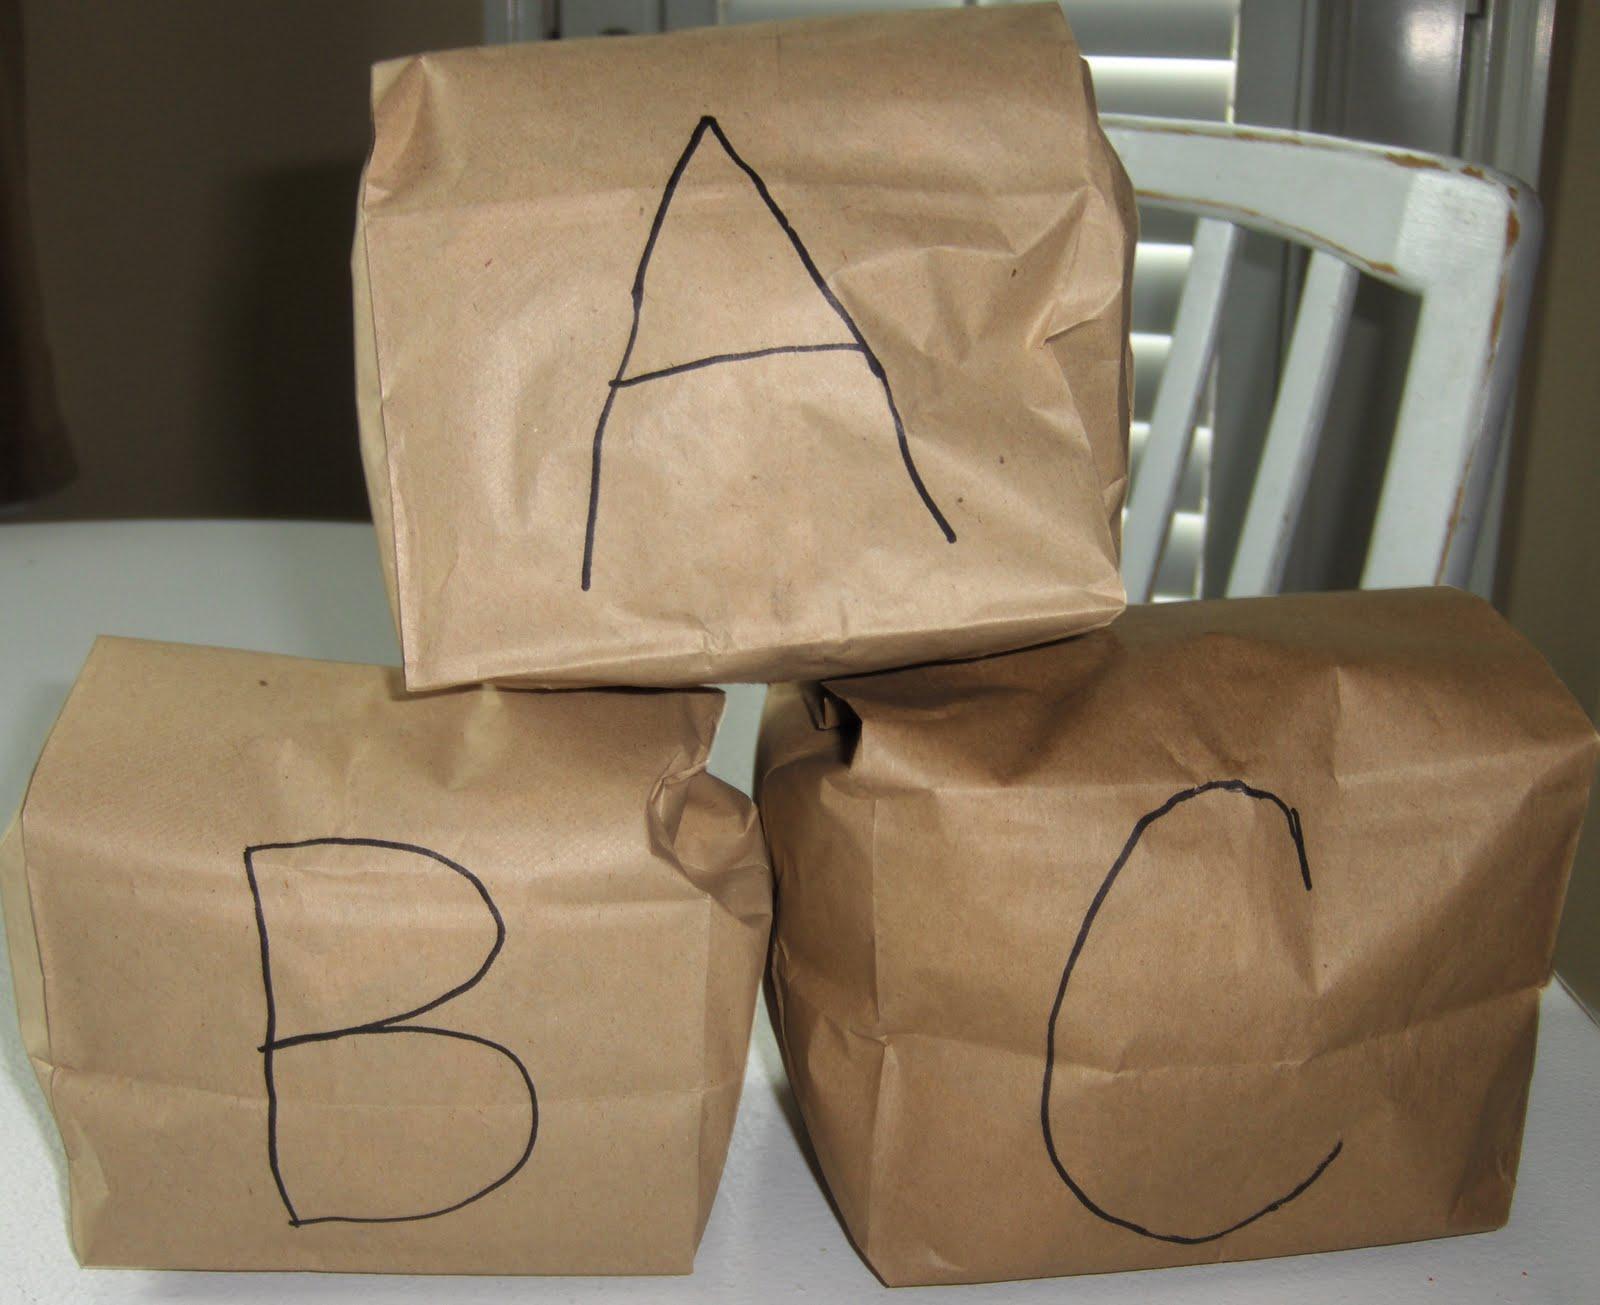 Paper bag activity - Paper Bag Letter Blocks